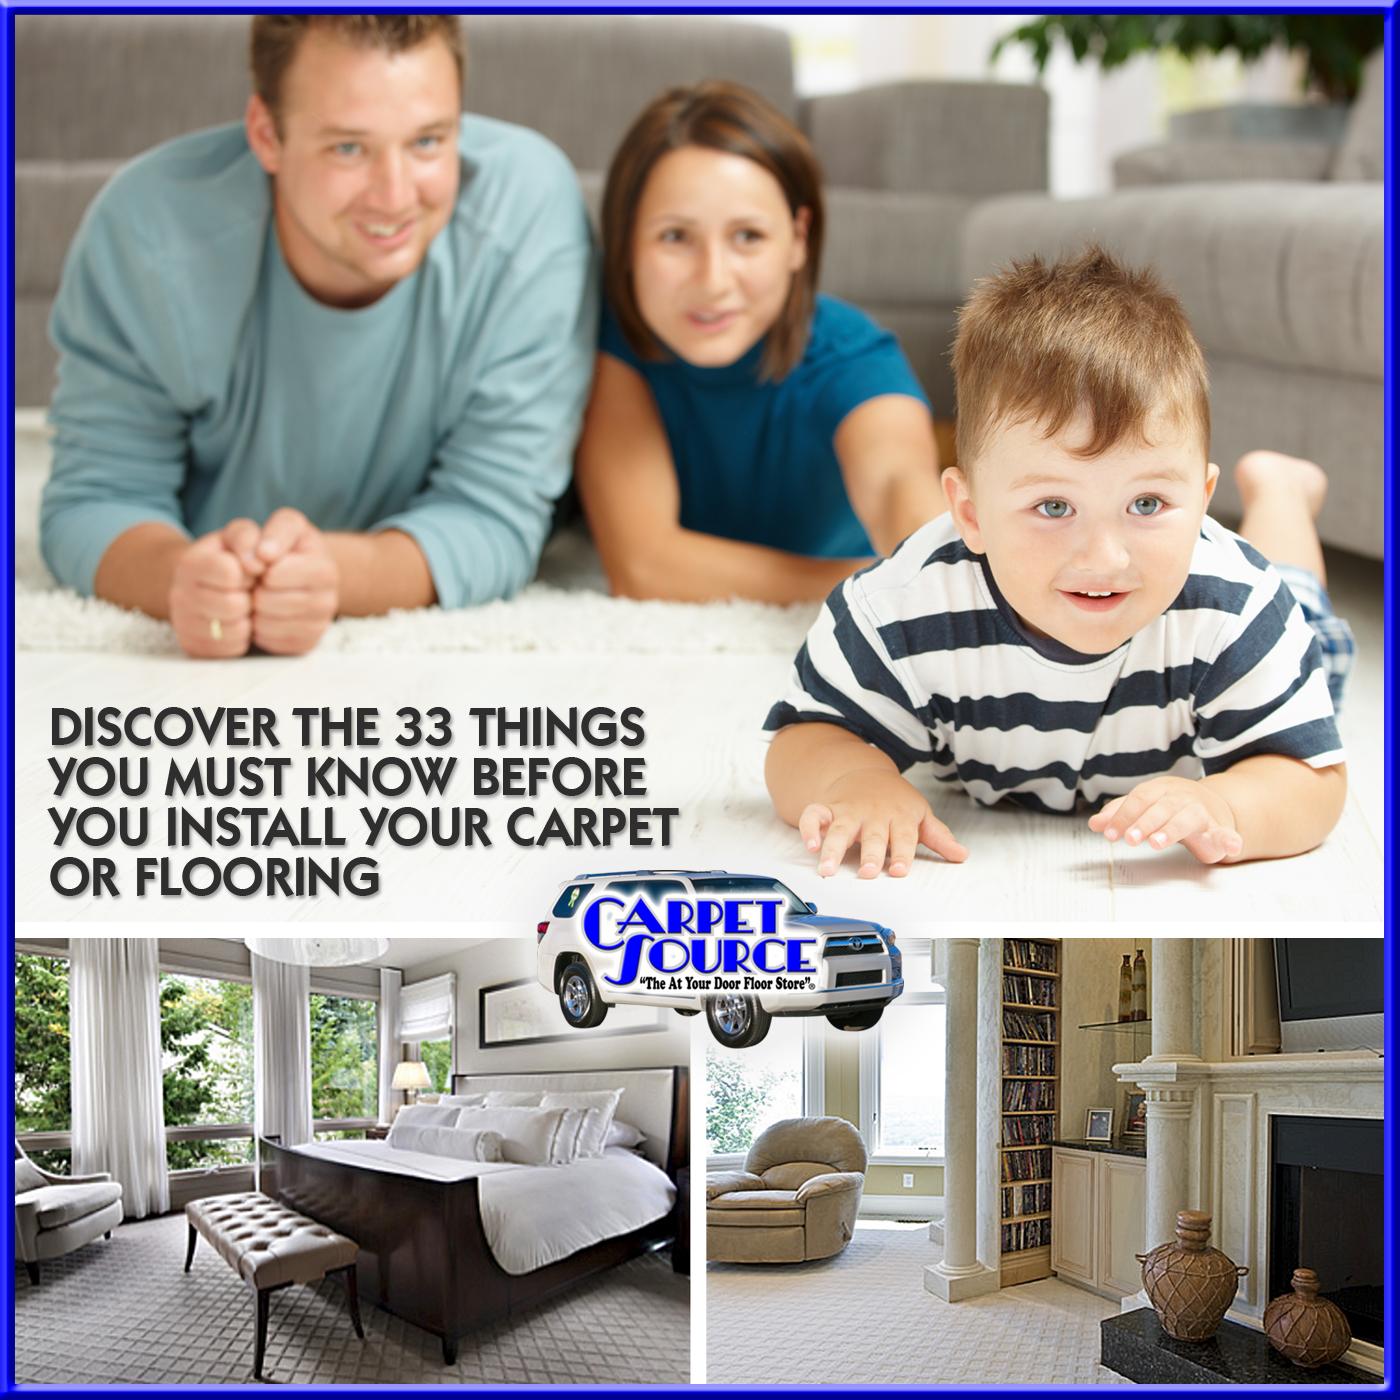 <![CDATA[Carpet Source Consumer Awareness Channel]]>